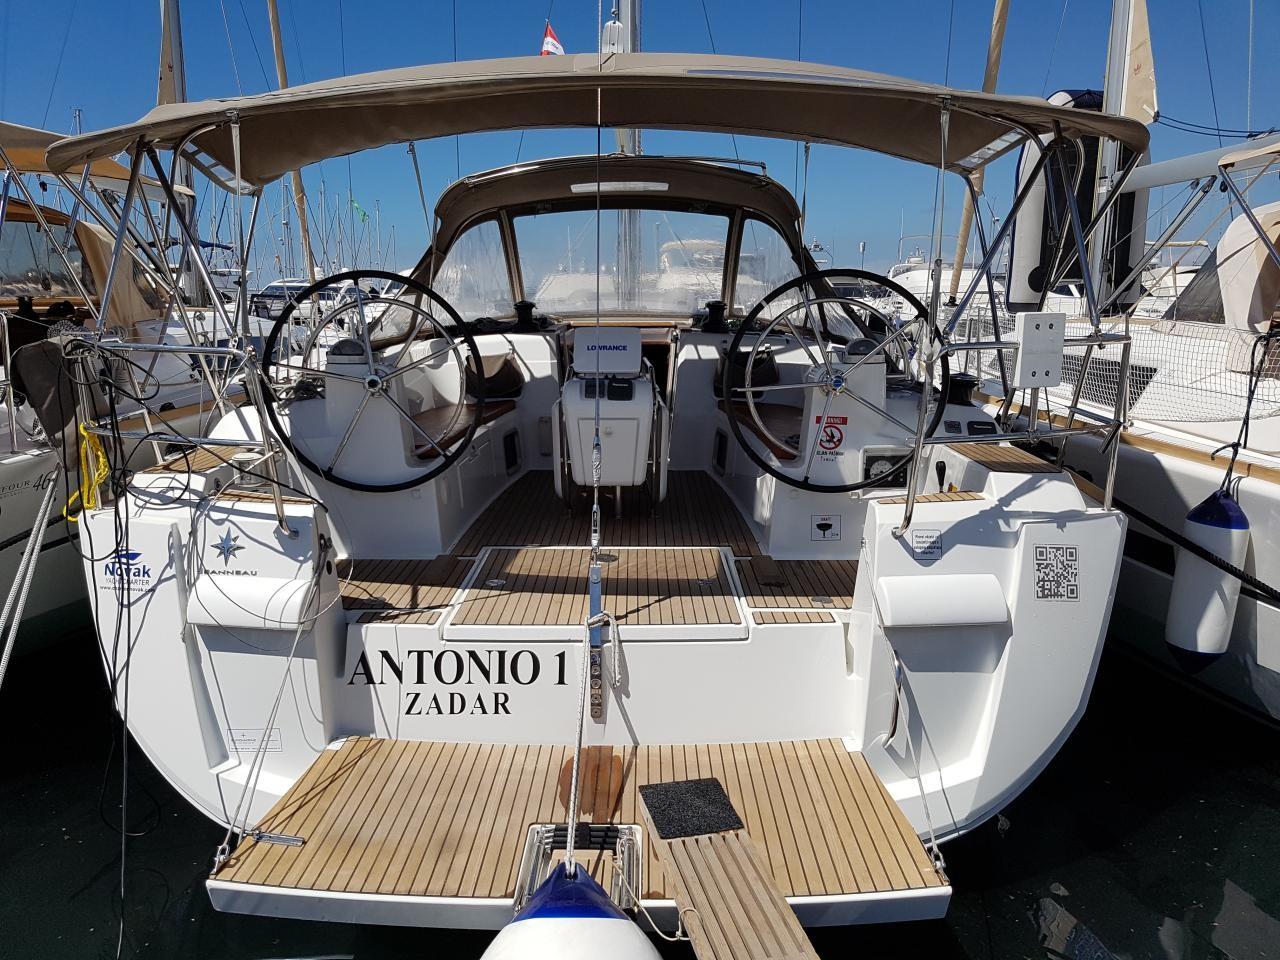 Sun Odyssey 469, Antonio 1